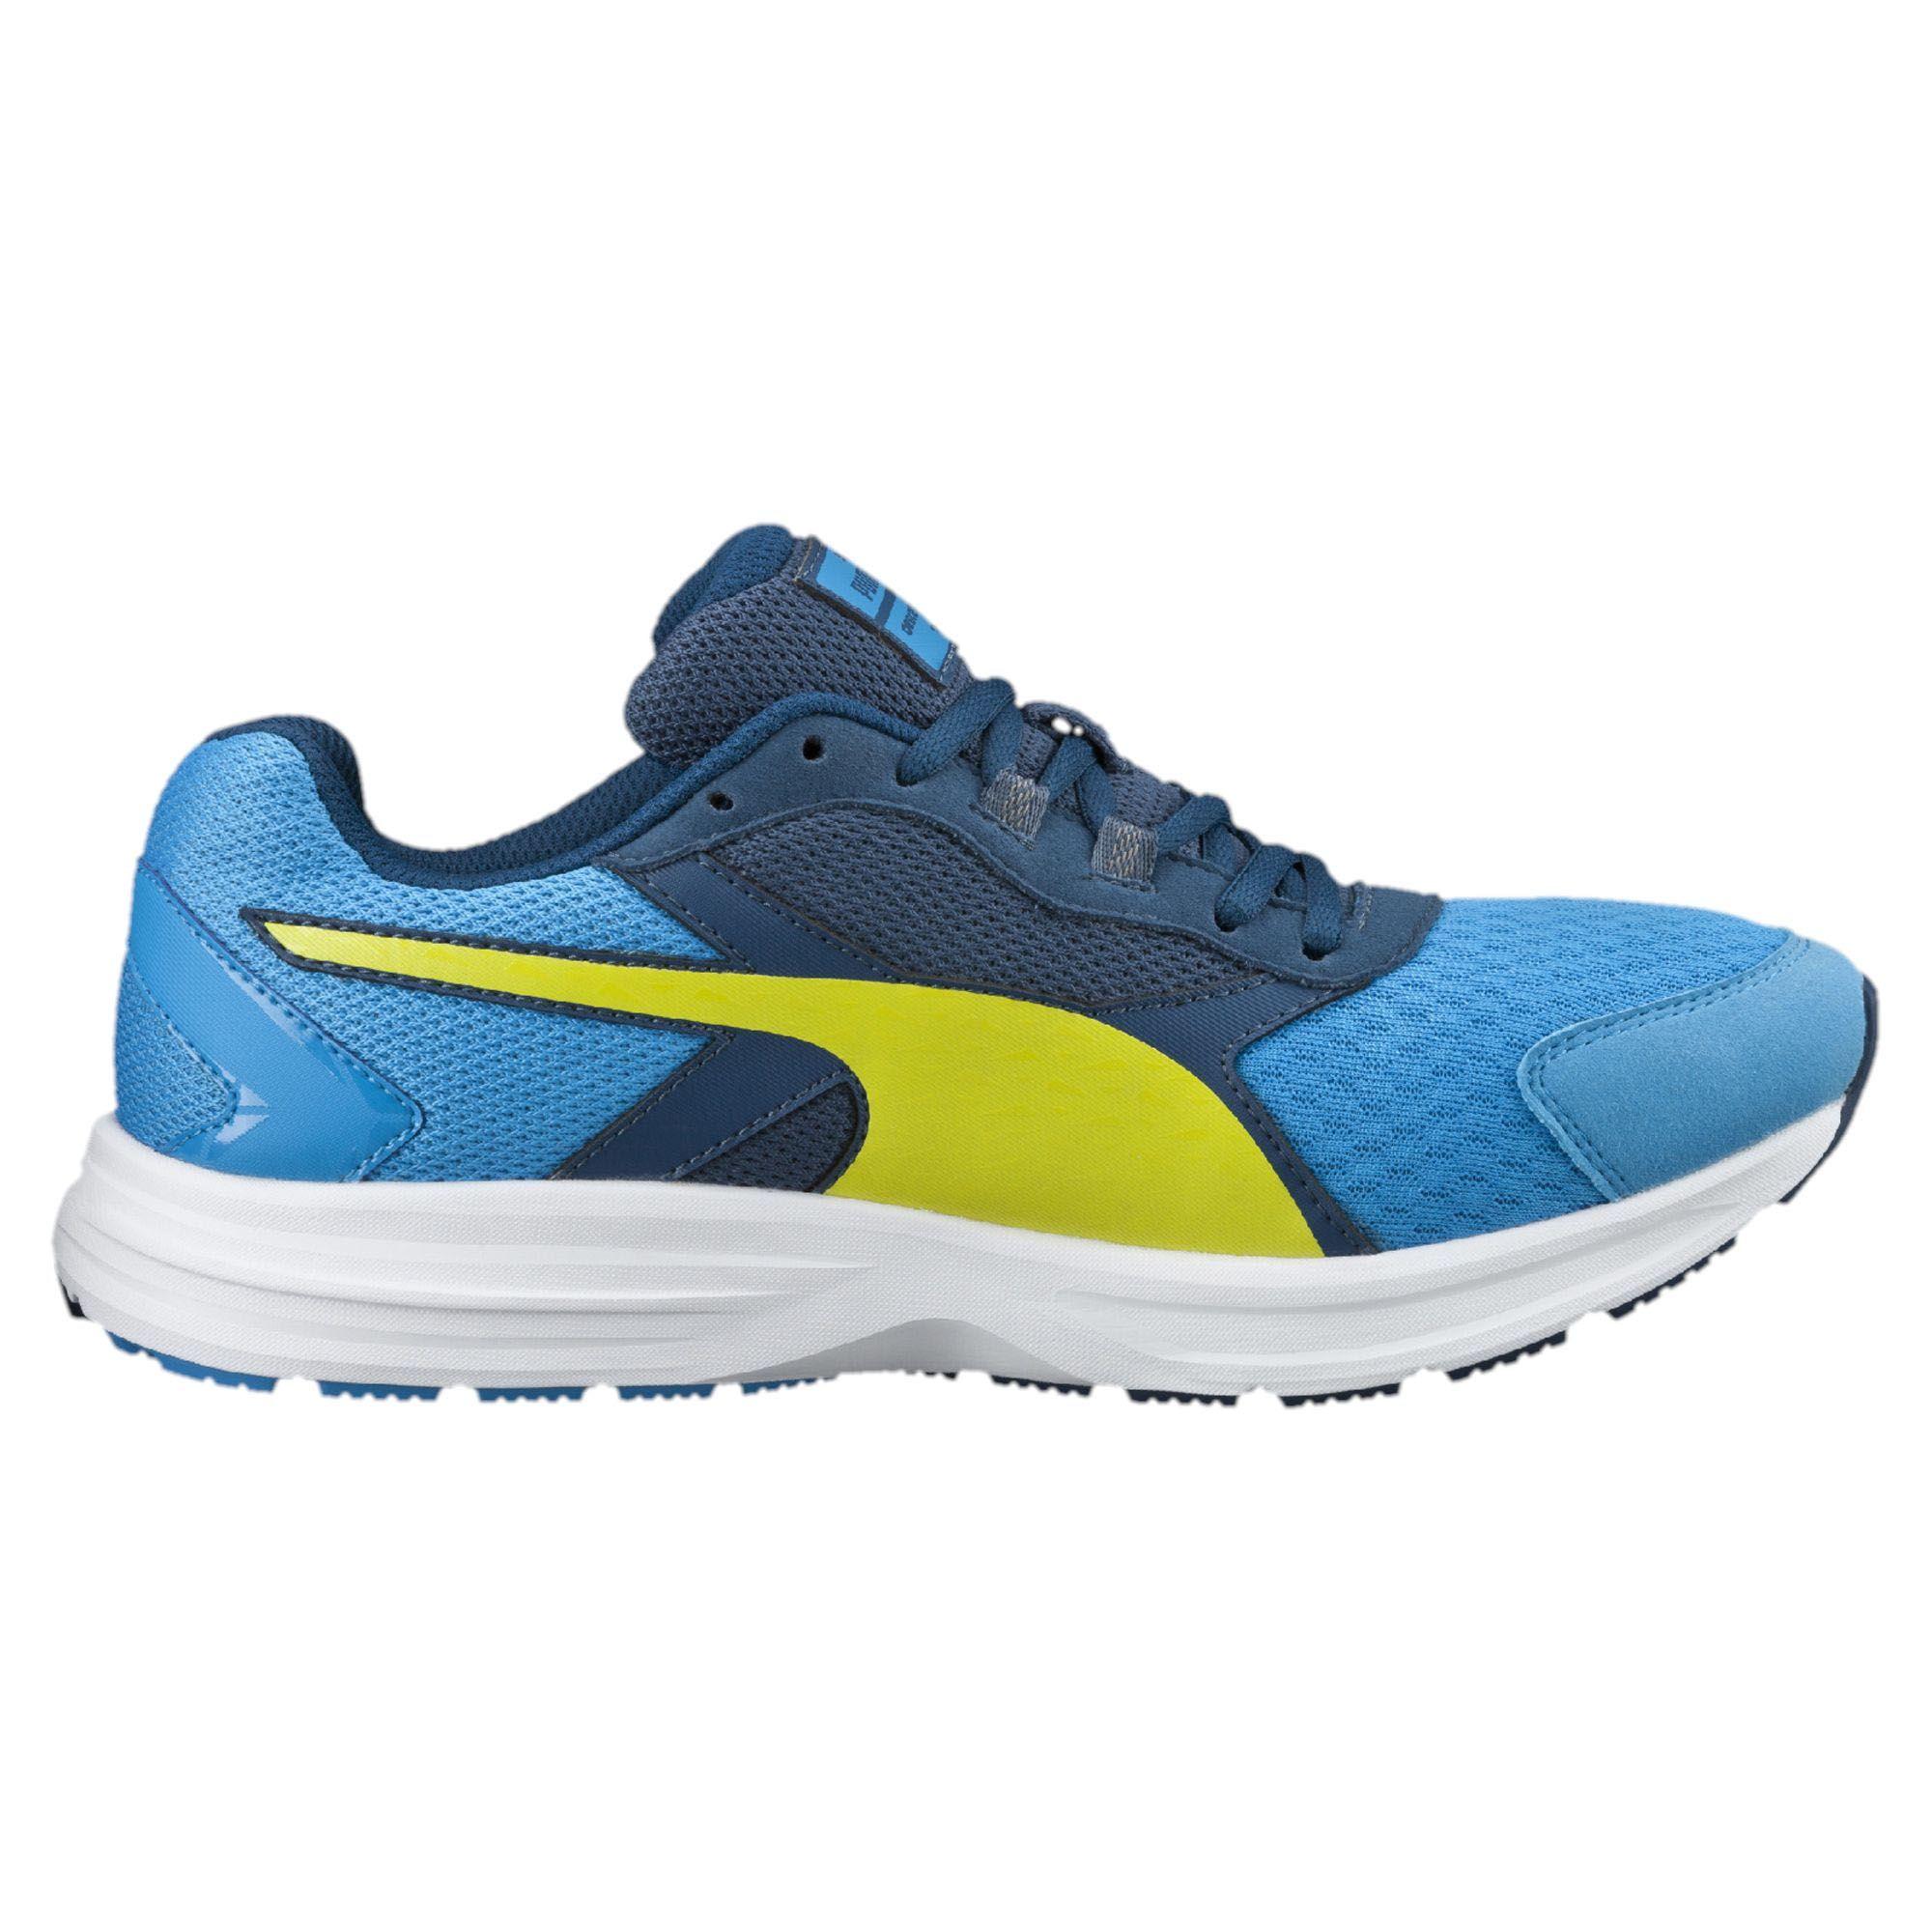 descendant v3 mens running shoes aw15 sweatband